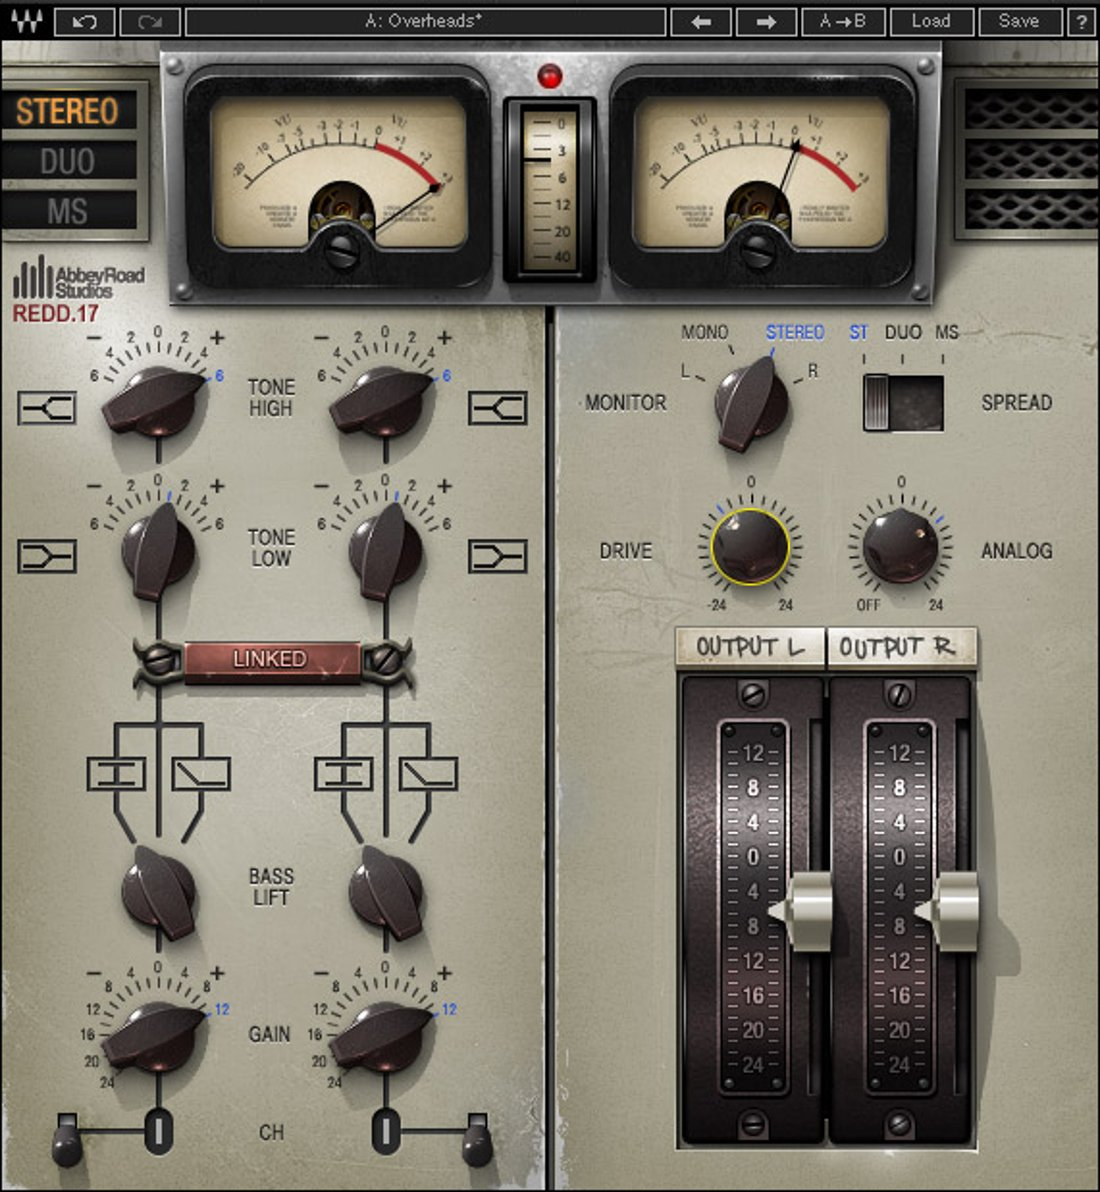 Waves SGREDD Classic Abbey Road Console Plug-in (Download